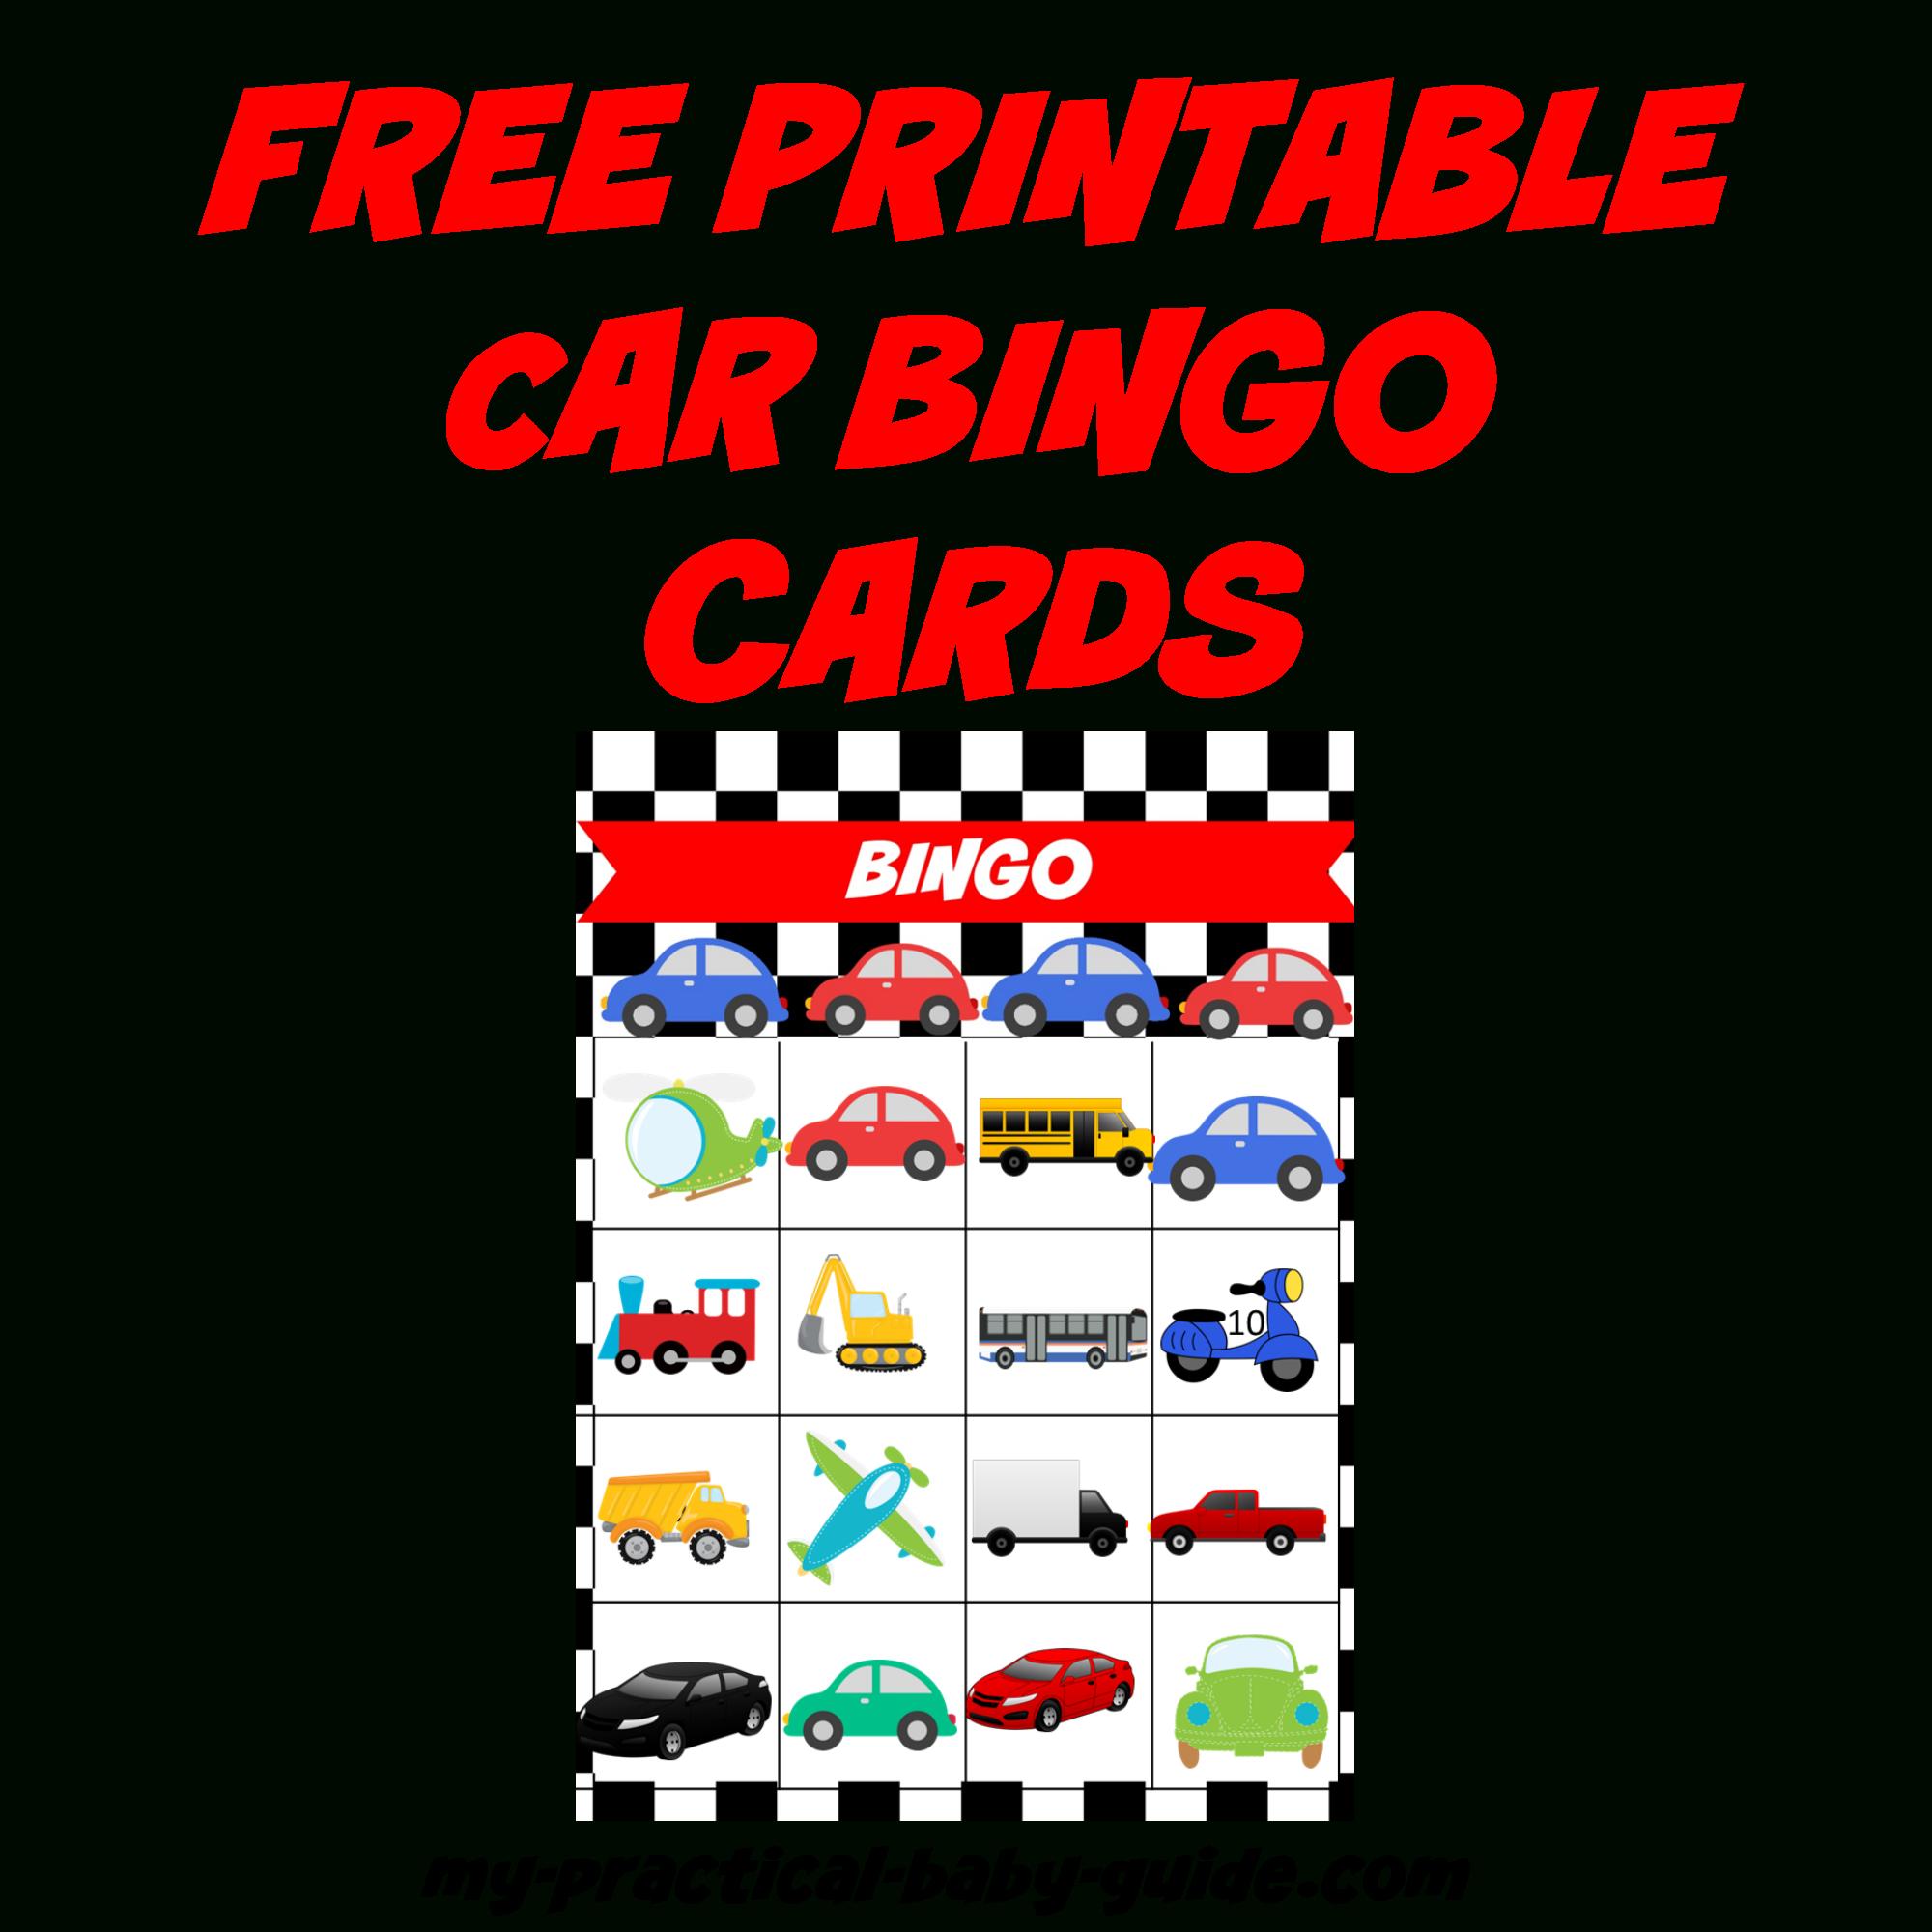 Coolest Car Birthday Ideas - My Practical Birthday Guide In 2019 - Free Printable Car Bingo